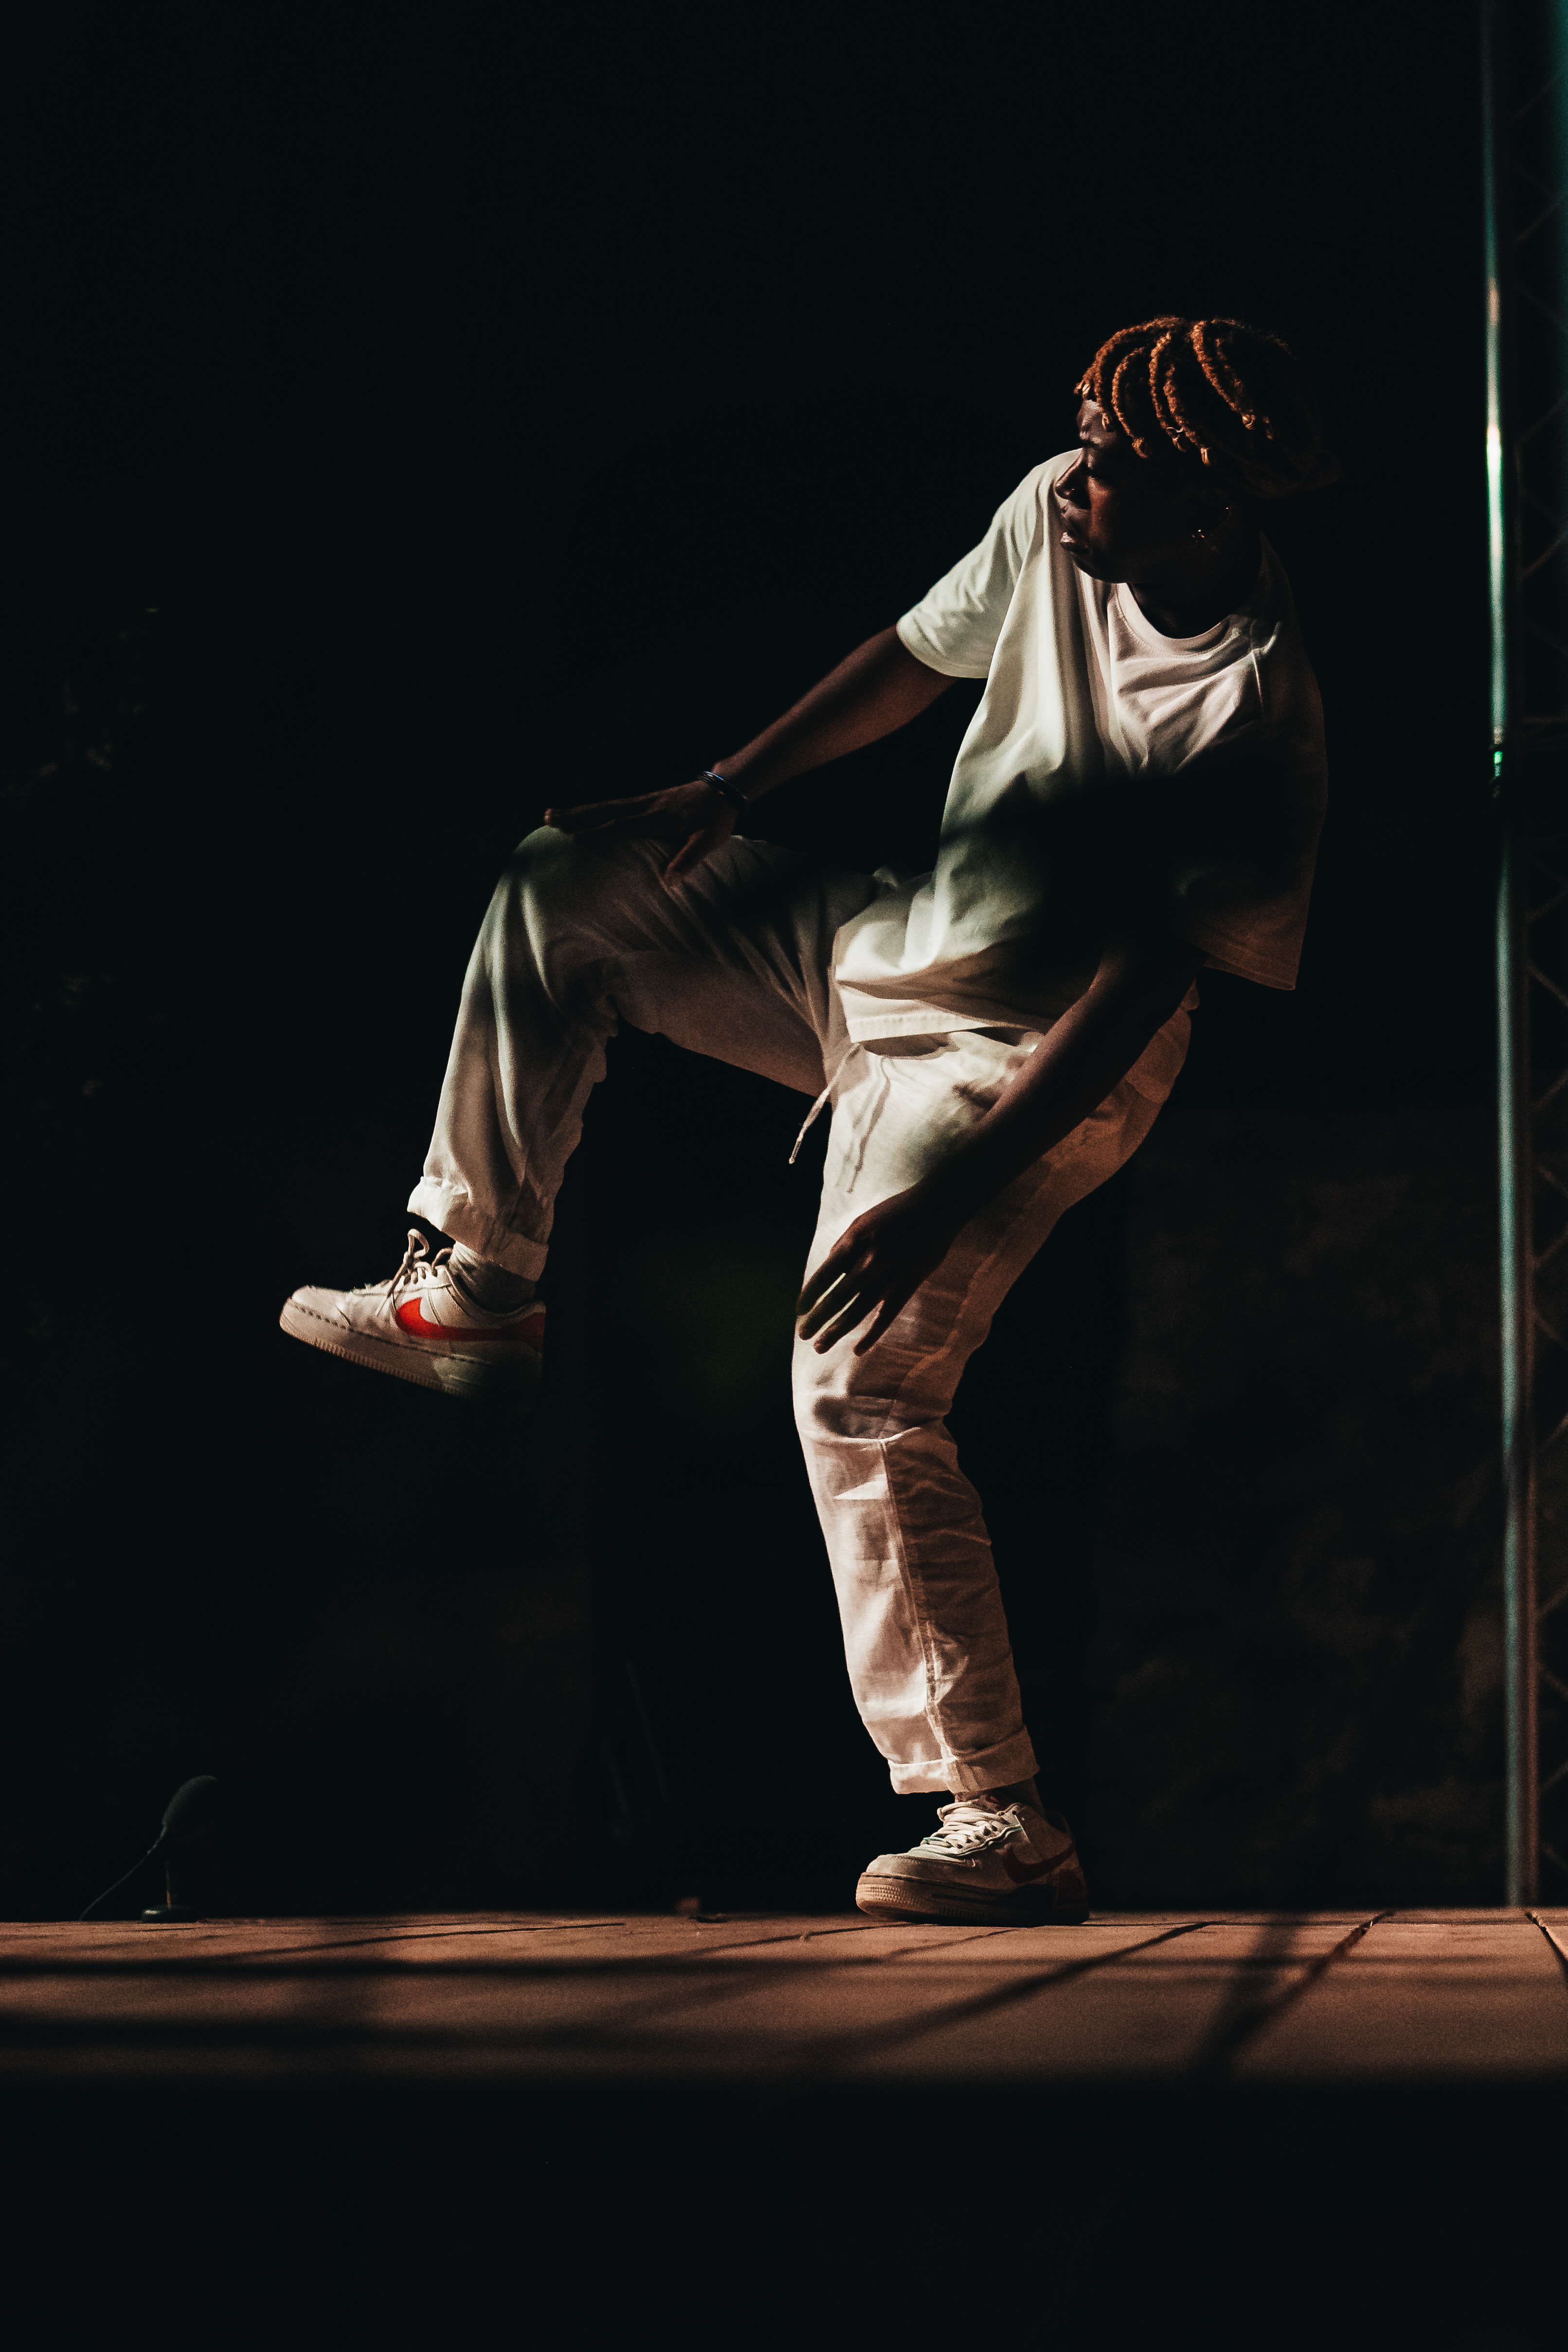 «Fusion» par Joëlle Sambi et Hendrickx Ntela ©️ J. Van Belle - WBI